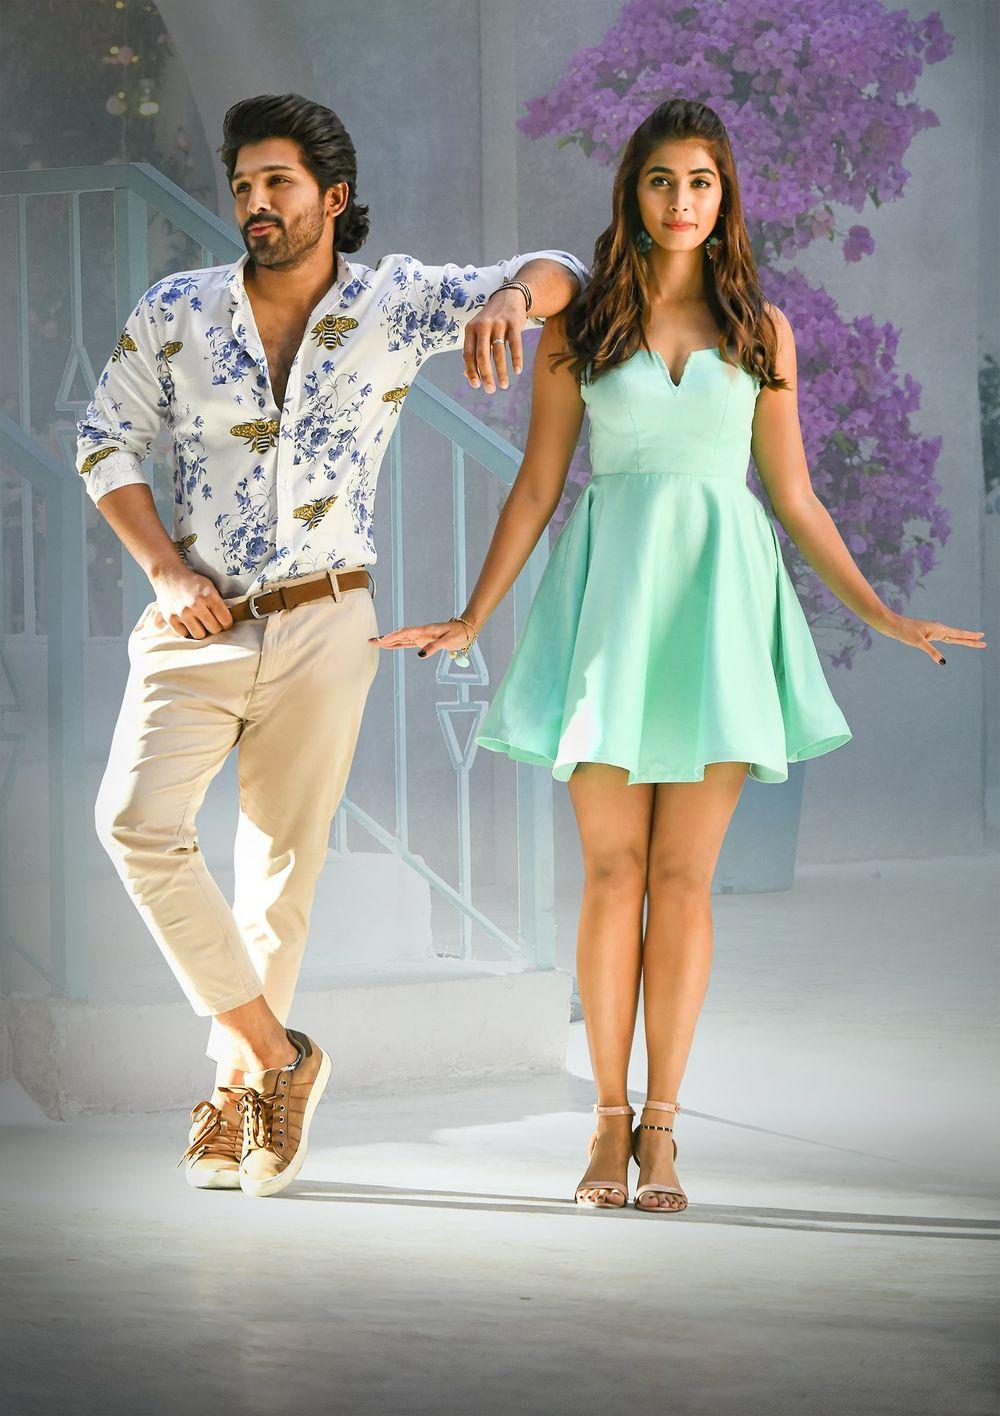 Ala Vaikunthapurramuloo (2020) Telegu Full Movie 480p, 720p, 1080p Netflix WEB-DL Download